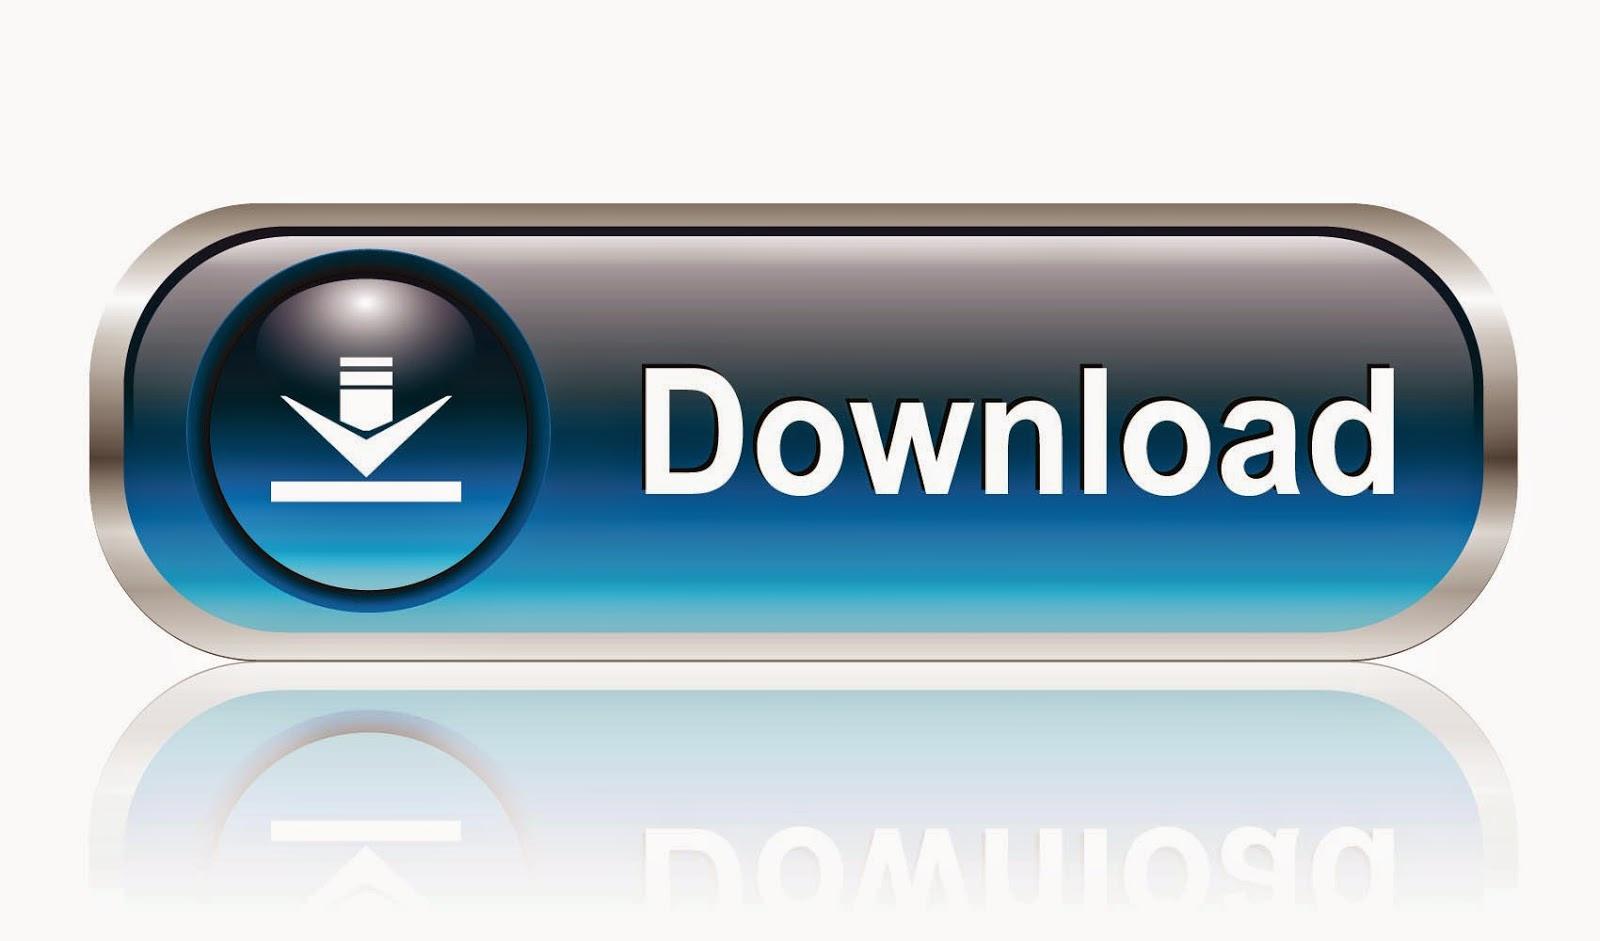 "<img src=""http://1.bp.blogspot.com/-2wUCm9Vtvxc/U2PQ8MZXL_I/AAAAAAAACc4/vx_Y5hyfd4A/s1600/adobe-acrobat-professional-free-download.png"" alt=""Adobe Acrobat Professional 8.0 Free Download"" />"